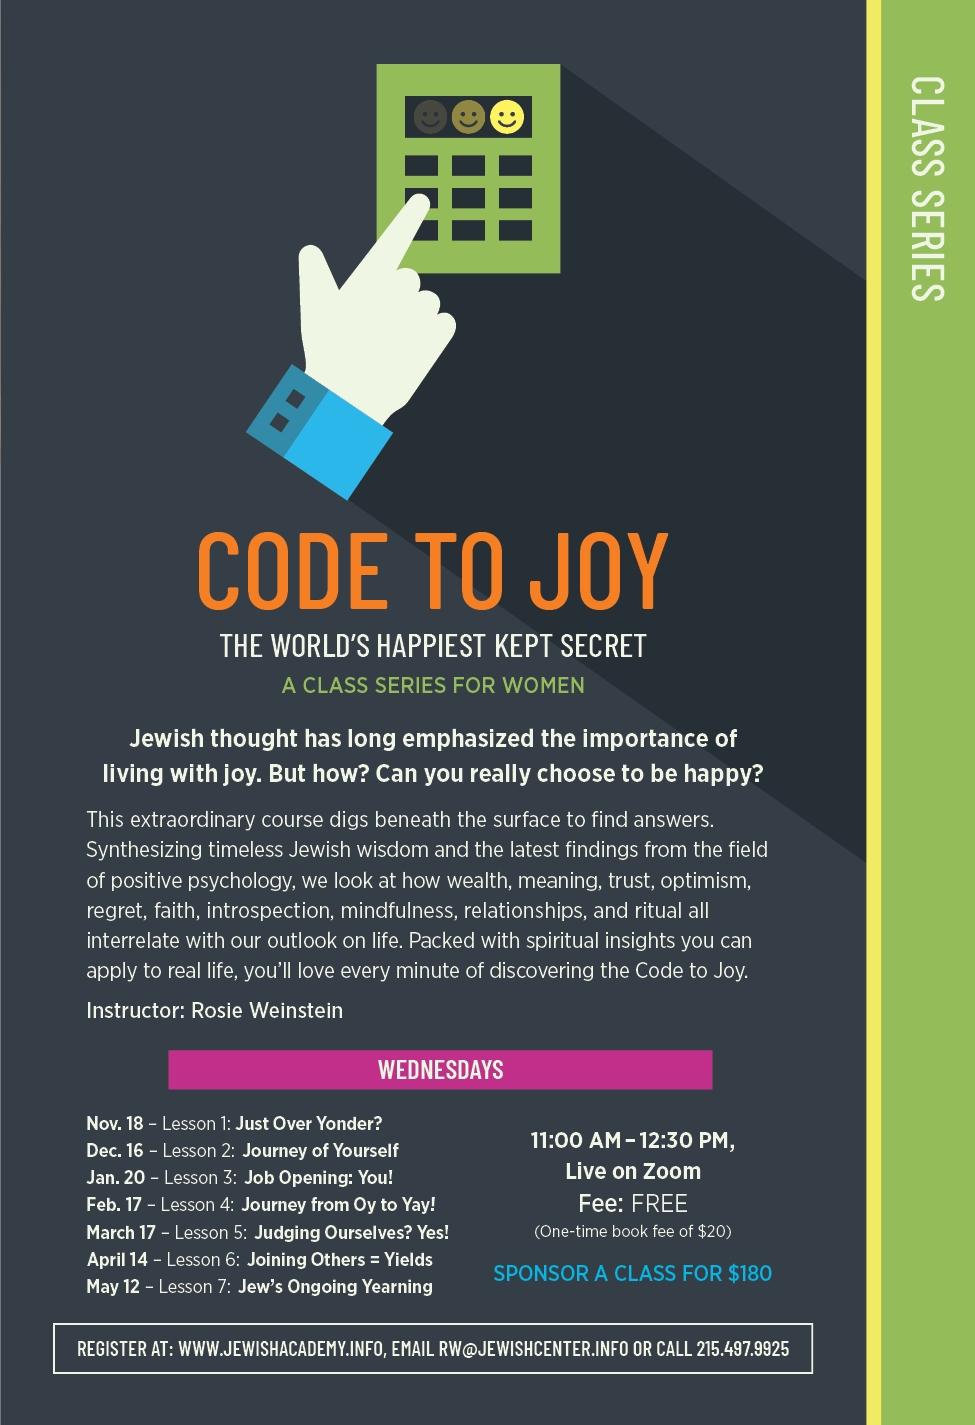 Bucks_JLA_Code_Joy.jpg